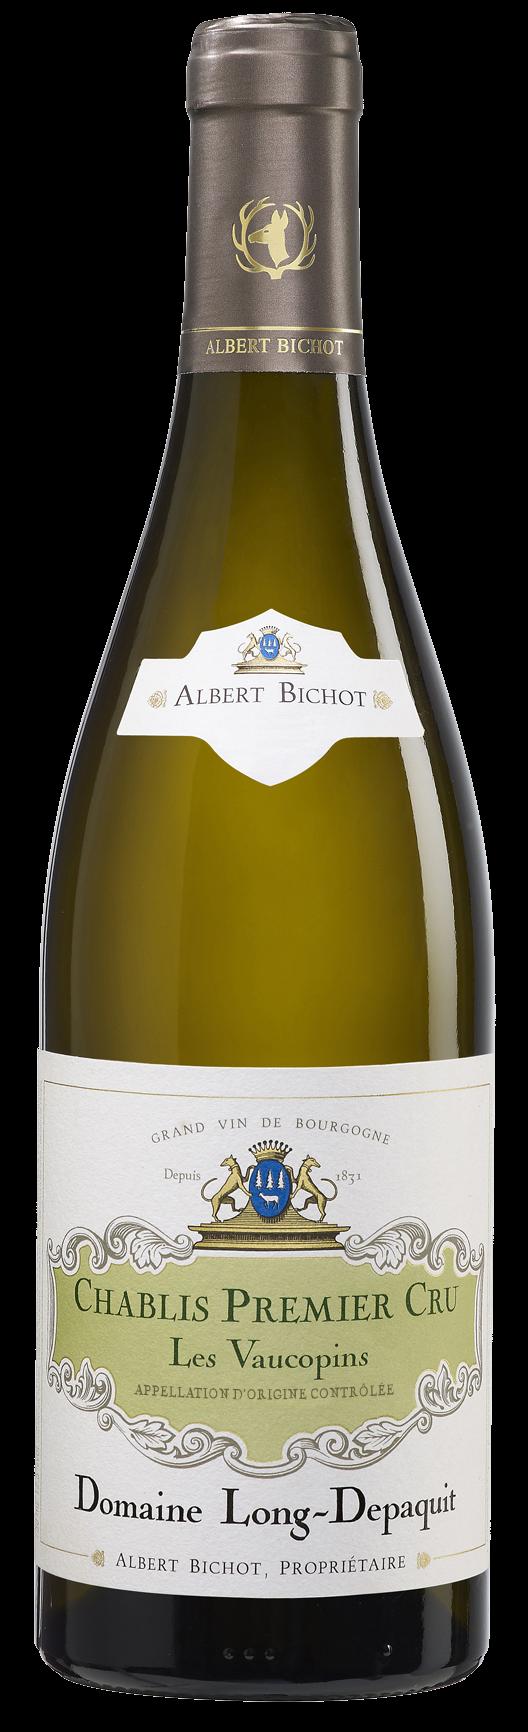 "2018 Chablis 1er Cru ""Les Vacoupins"" Domaine Long-Depaquit Albert Bichot, Burgund"